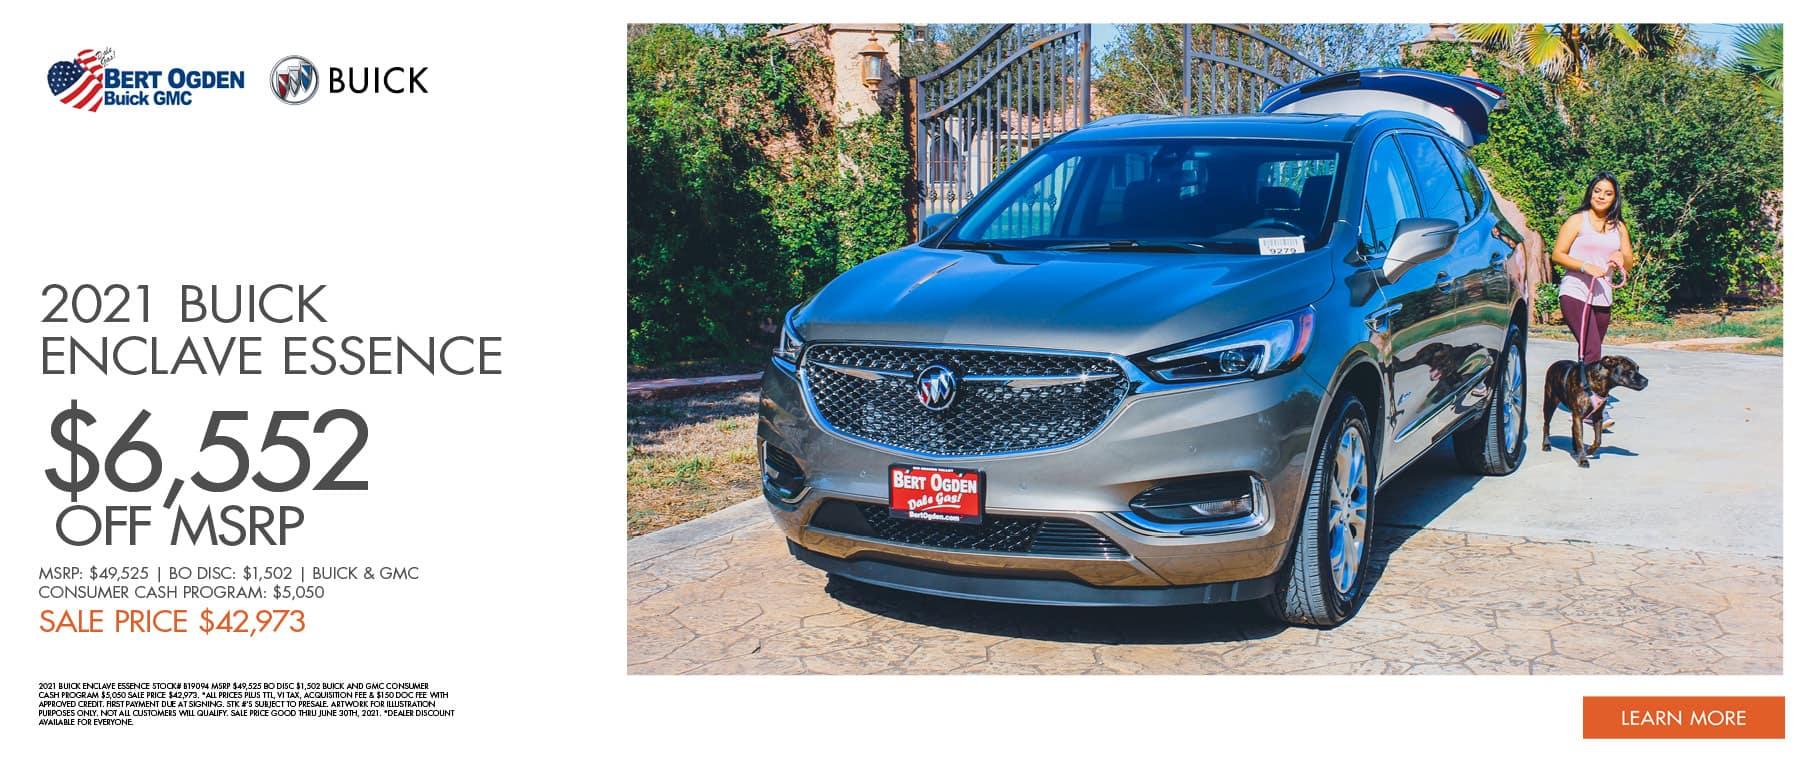 Save On The 2021 Buick Enclave Essence | Bert Ogden Buick GMC | Edinburg, TX